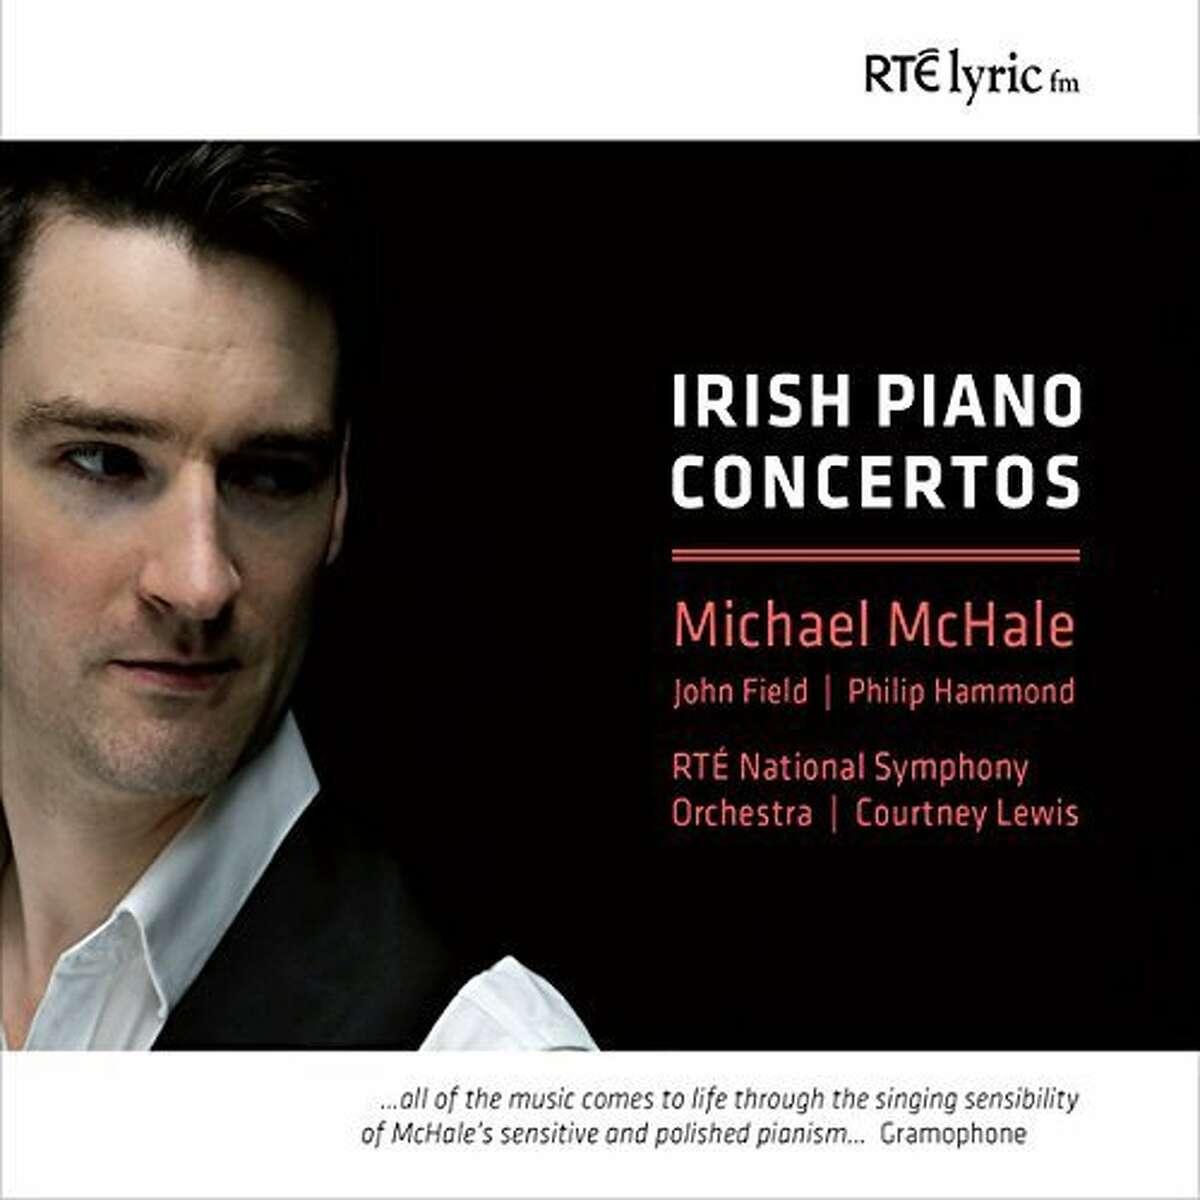 Michael McHale, Irish Piano Concertos